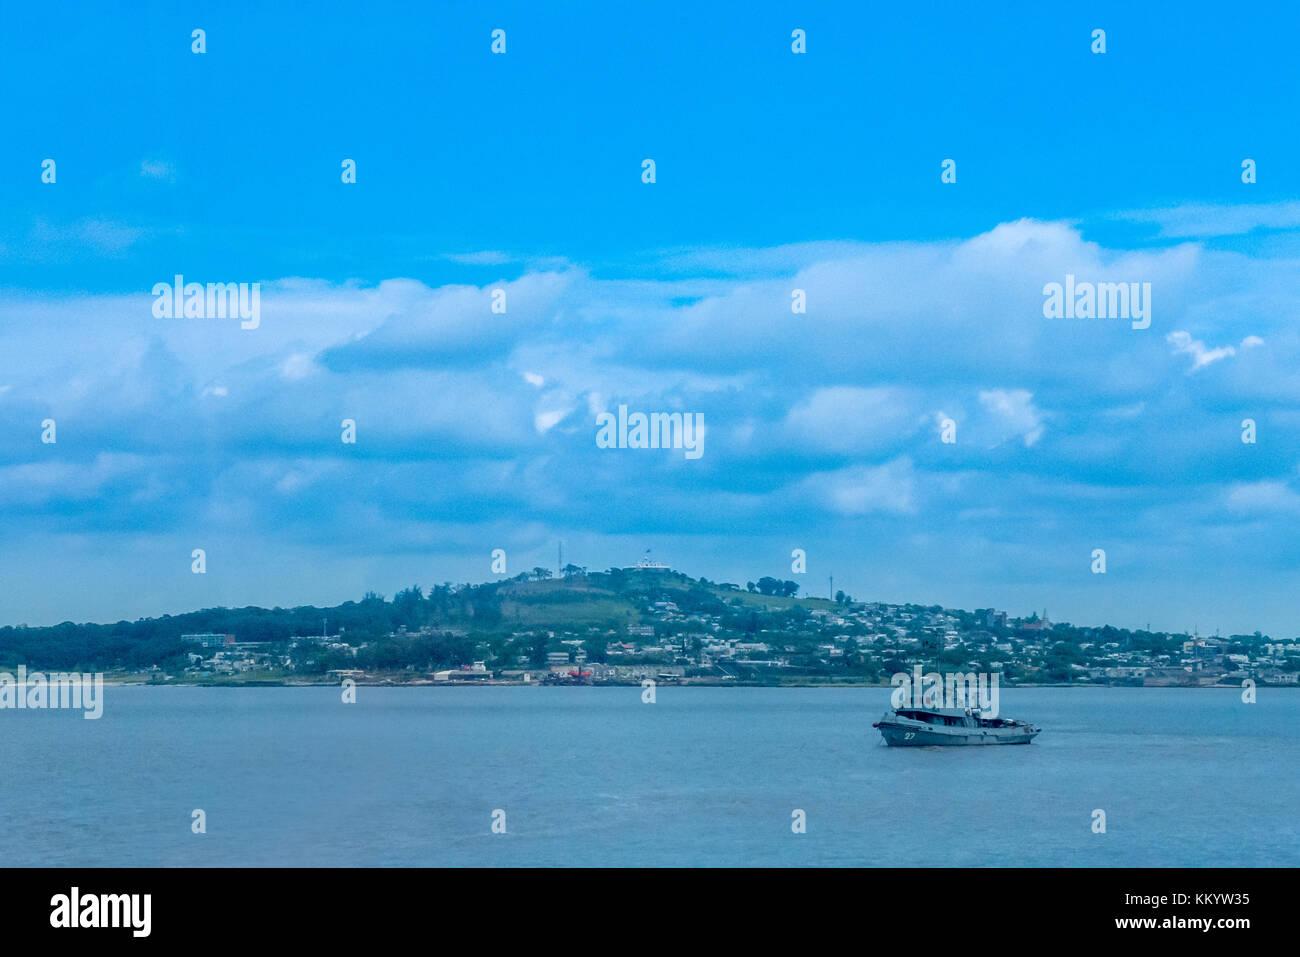 Looking across the bay in Montevideo, Uruguay Stock Photo